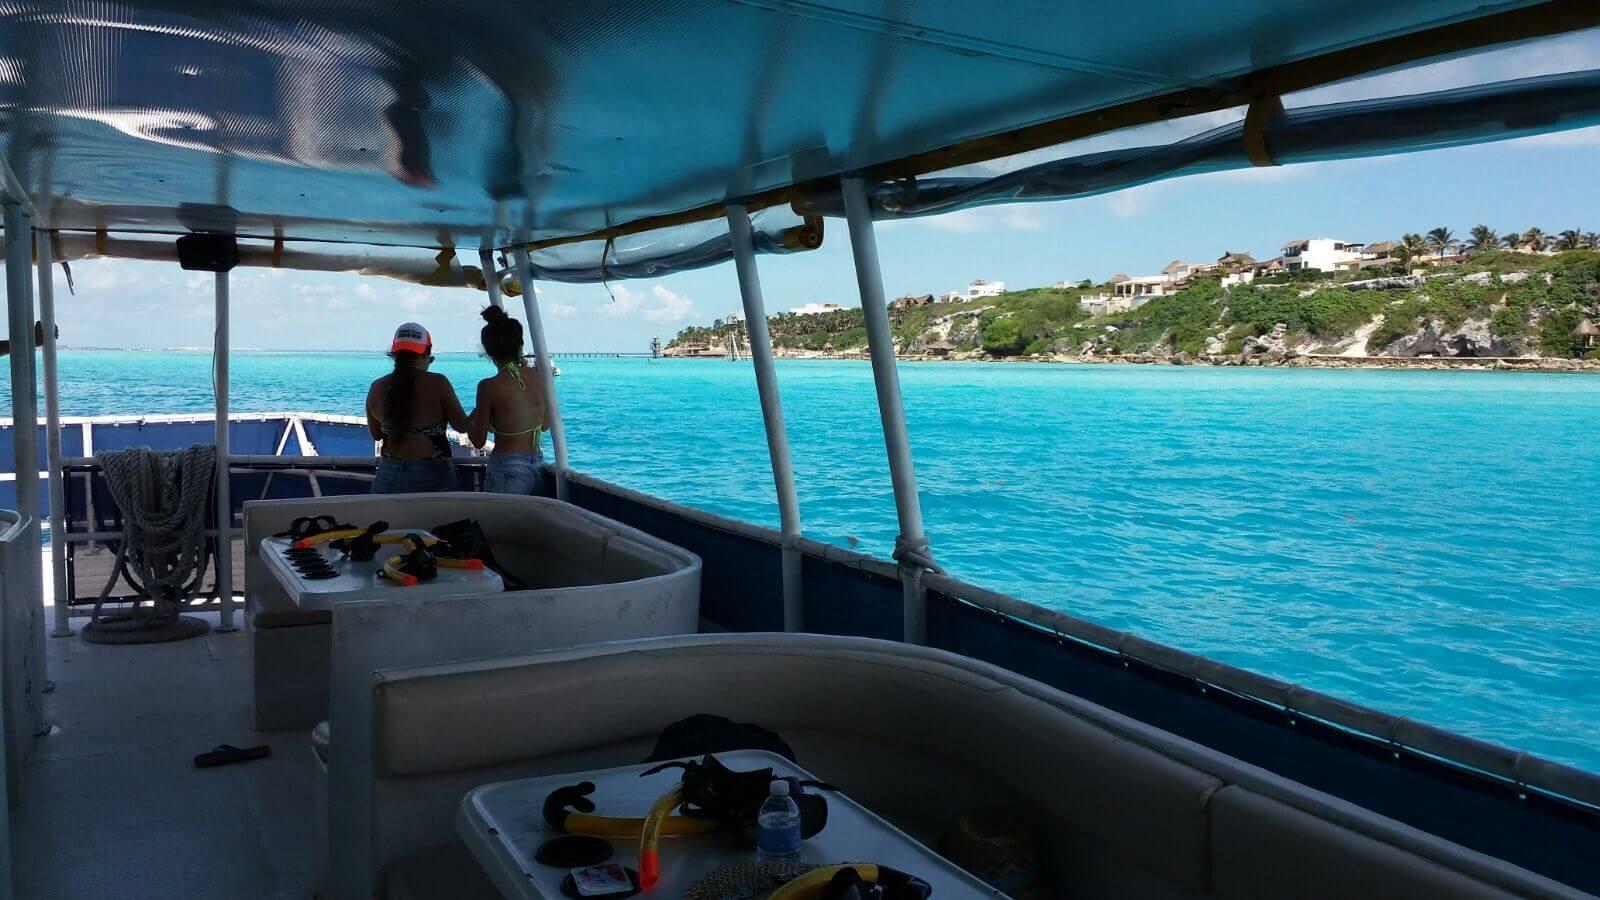 Cancun-Isla-Mujeres-Tours-Snorkel-Beach-All-Inclusive-3